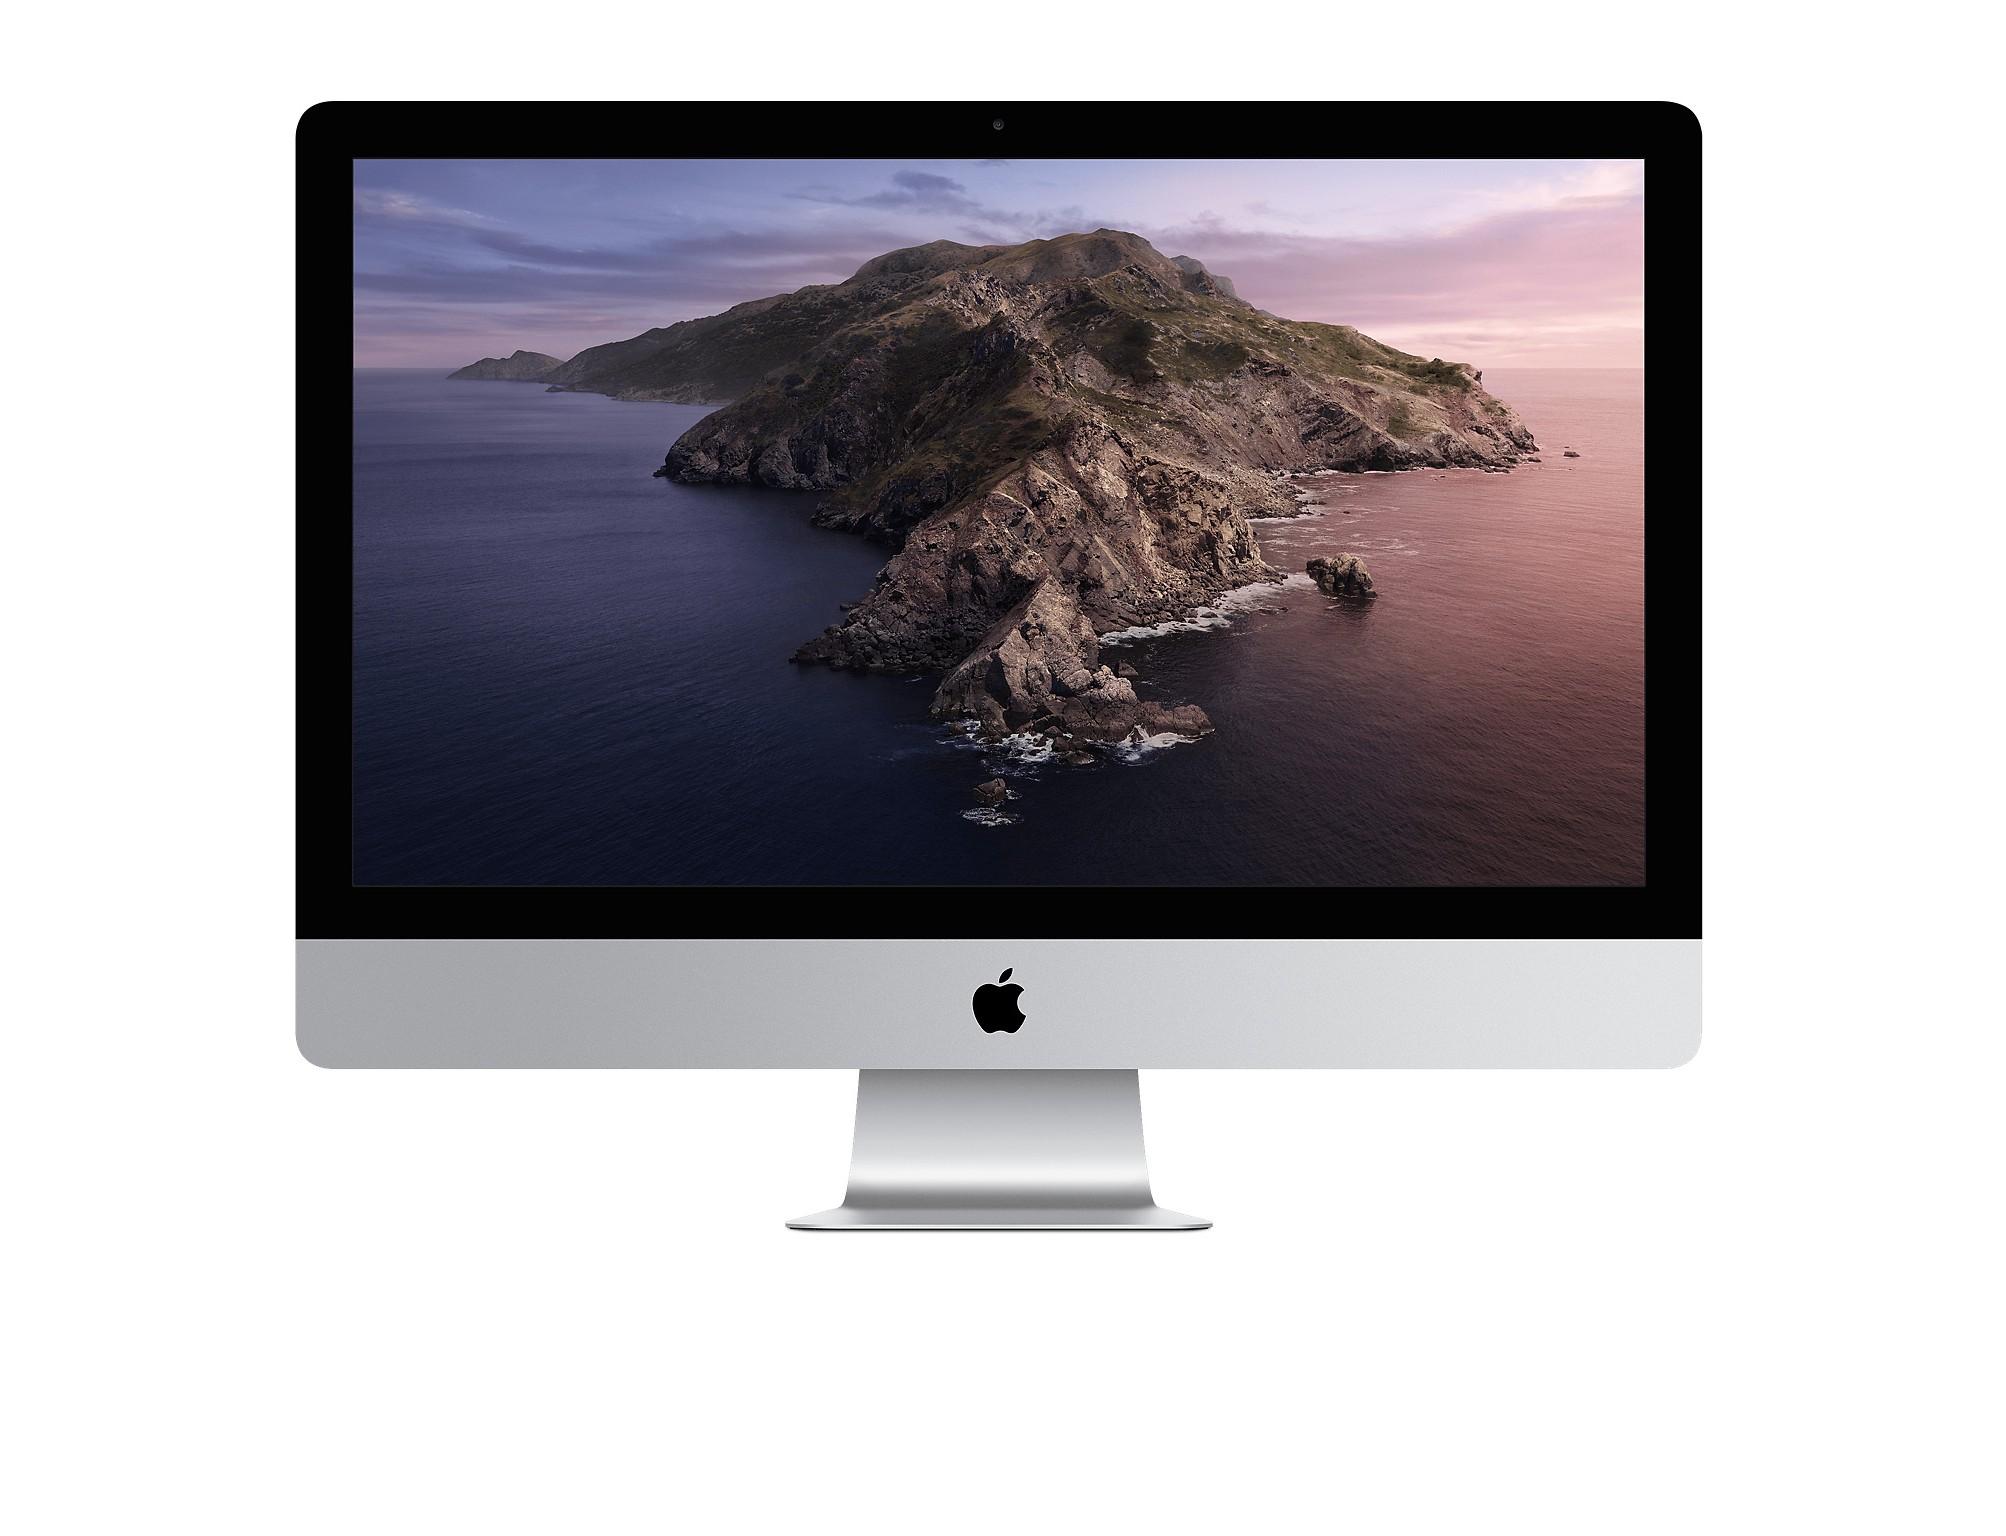 MXWT2SA/A - iMac 27 inch 5K Retina 2020 - Intel Core i5 Gen 10 6-core 3.1GHz / Option Ram 16GB / 256GB